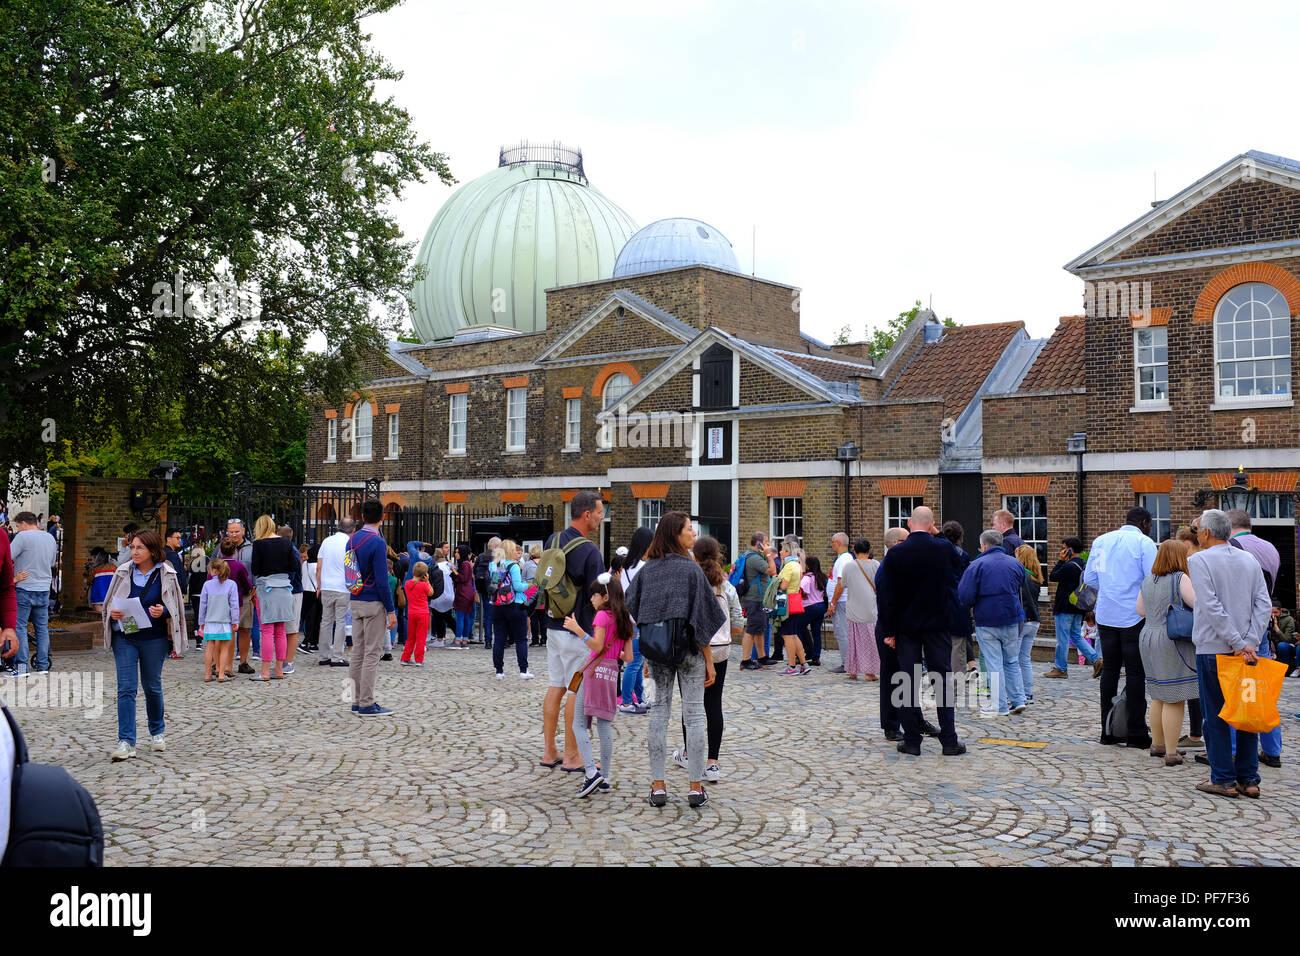 The Royal Observatory Greenwich London UK - Stock Image